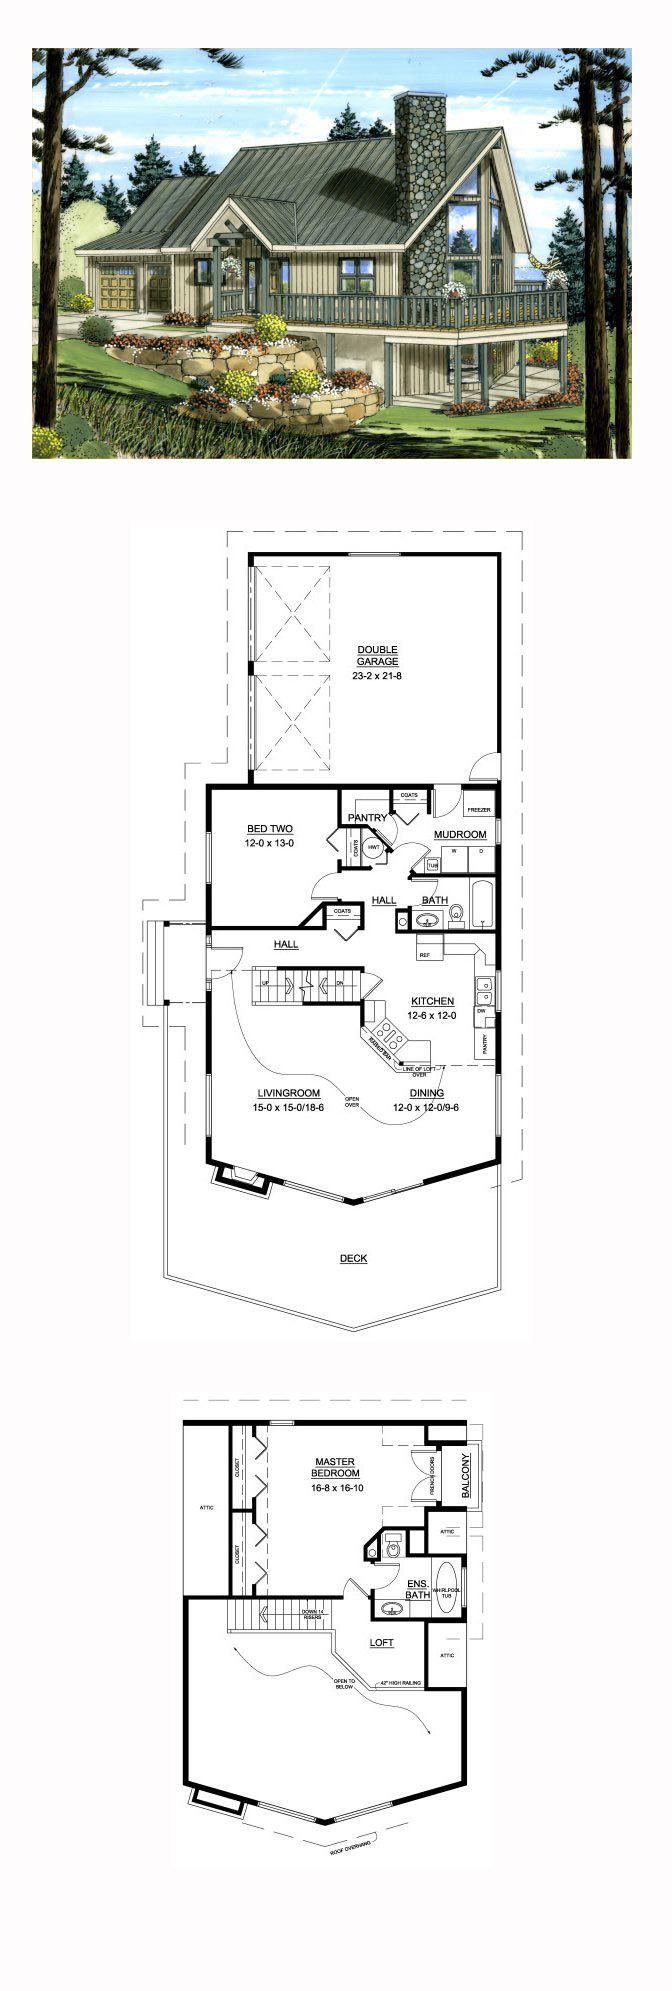 42 best best selling home plans images on pinterest house floor